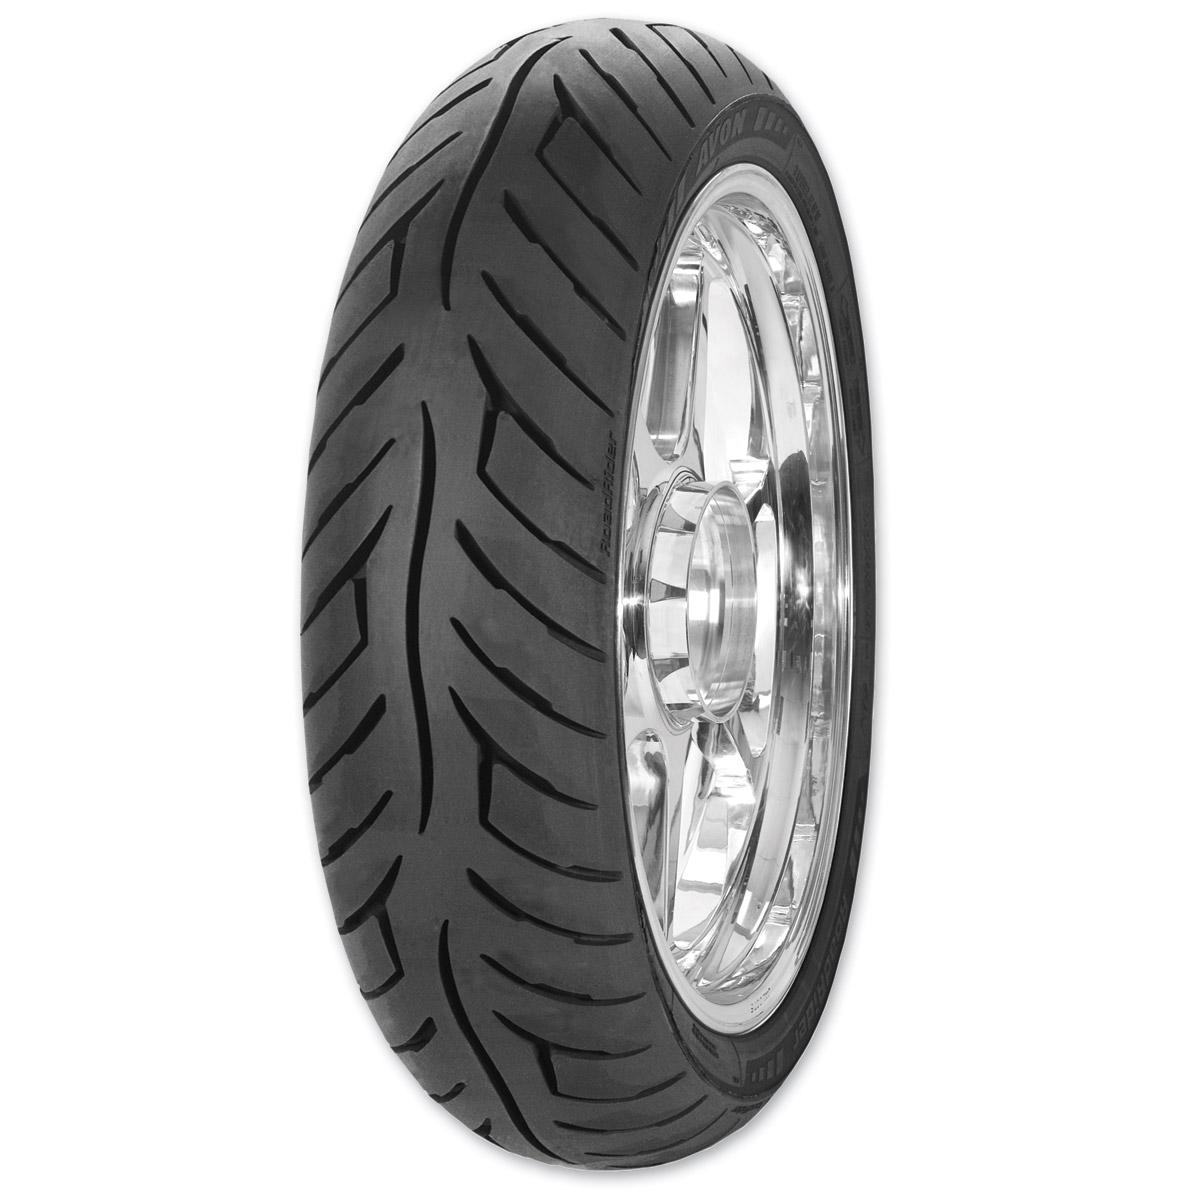 Avon AM26 Roadrider 120/80-18 Rear Tire